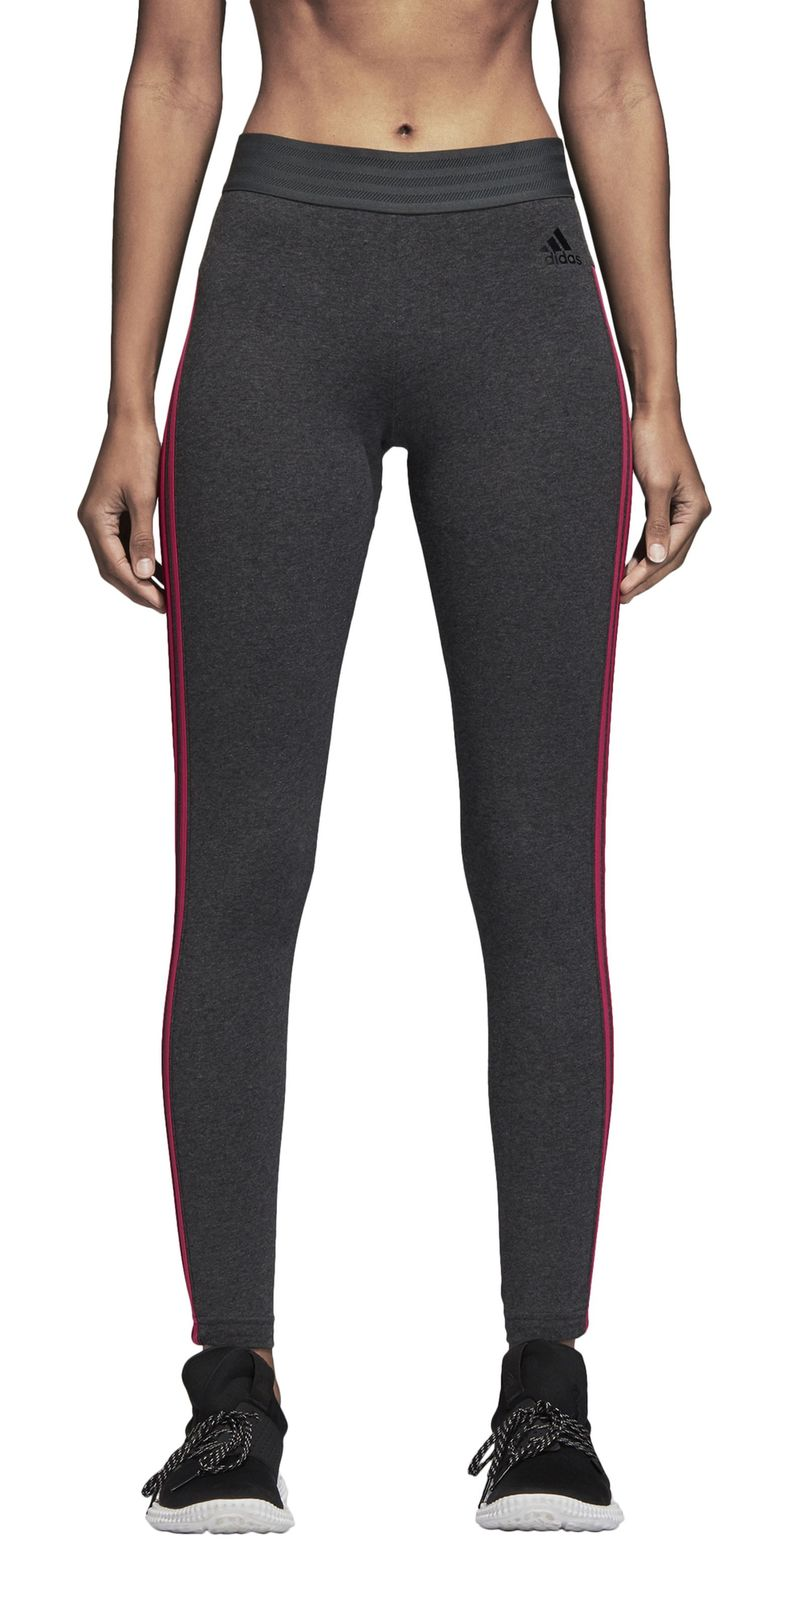 adidas core damen sport fitness hose essentials 3 stripes tight grau rosa. Black Bedroom Furniture Sets. Home Design Ideas